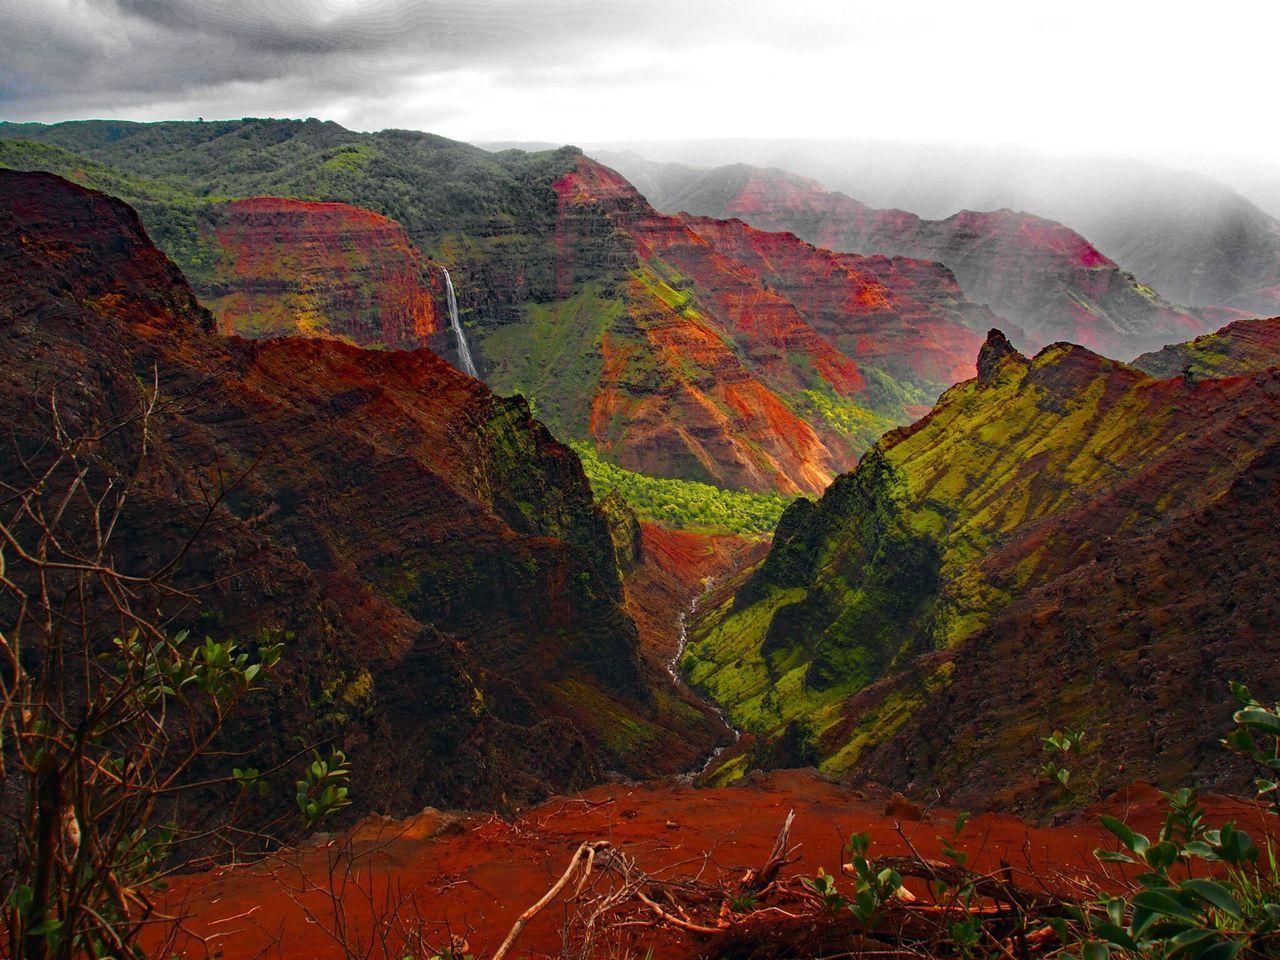 Multi Colored Autumn Beauty In Nature Scenics Travel Destinations Mountain Fog Rock - Object Nature Cloud - Sky Landscape Day Outdoors No People Water Kauai Hawaii Kauai